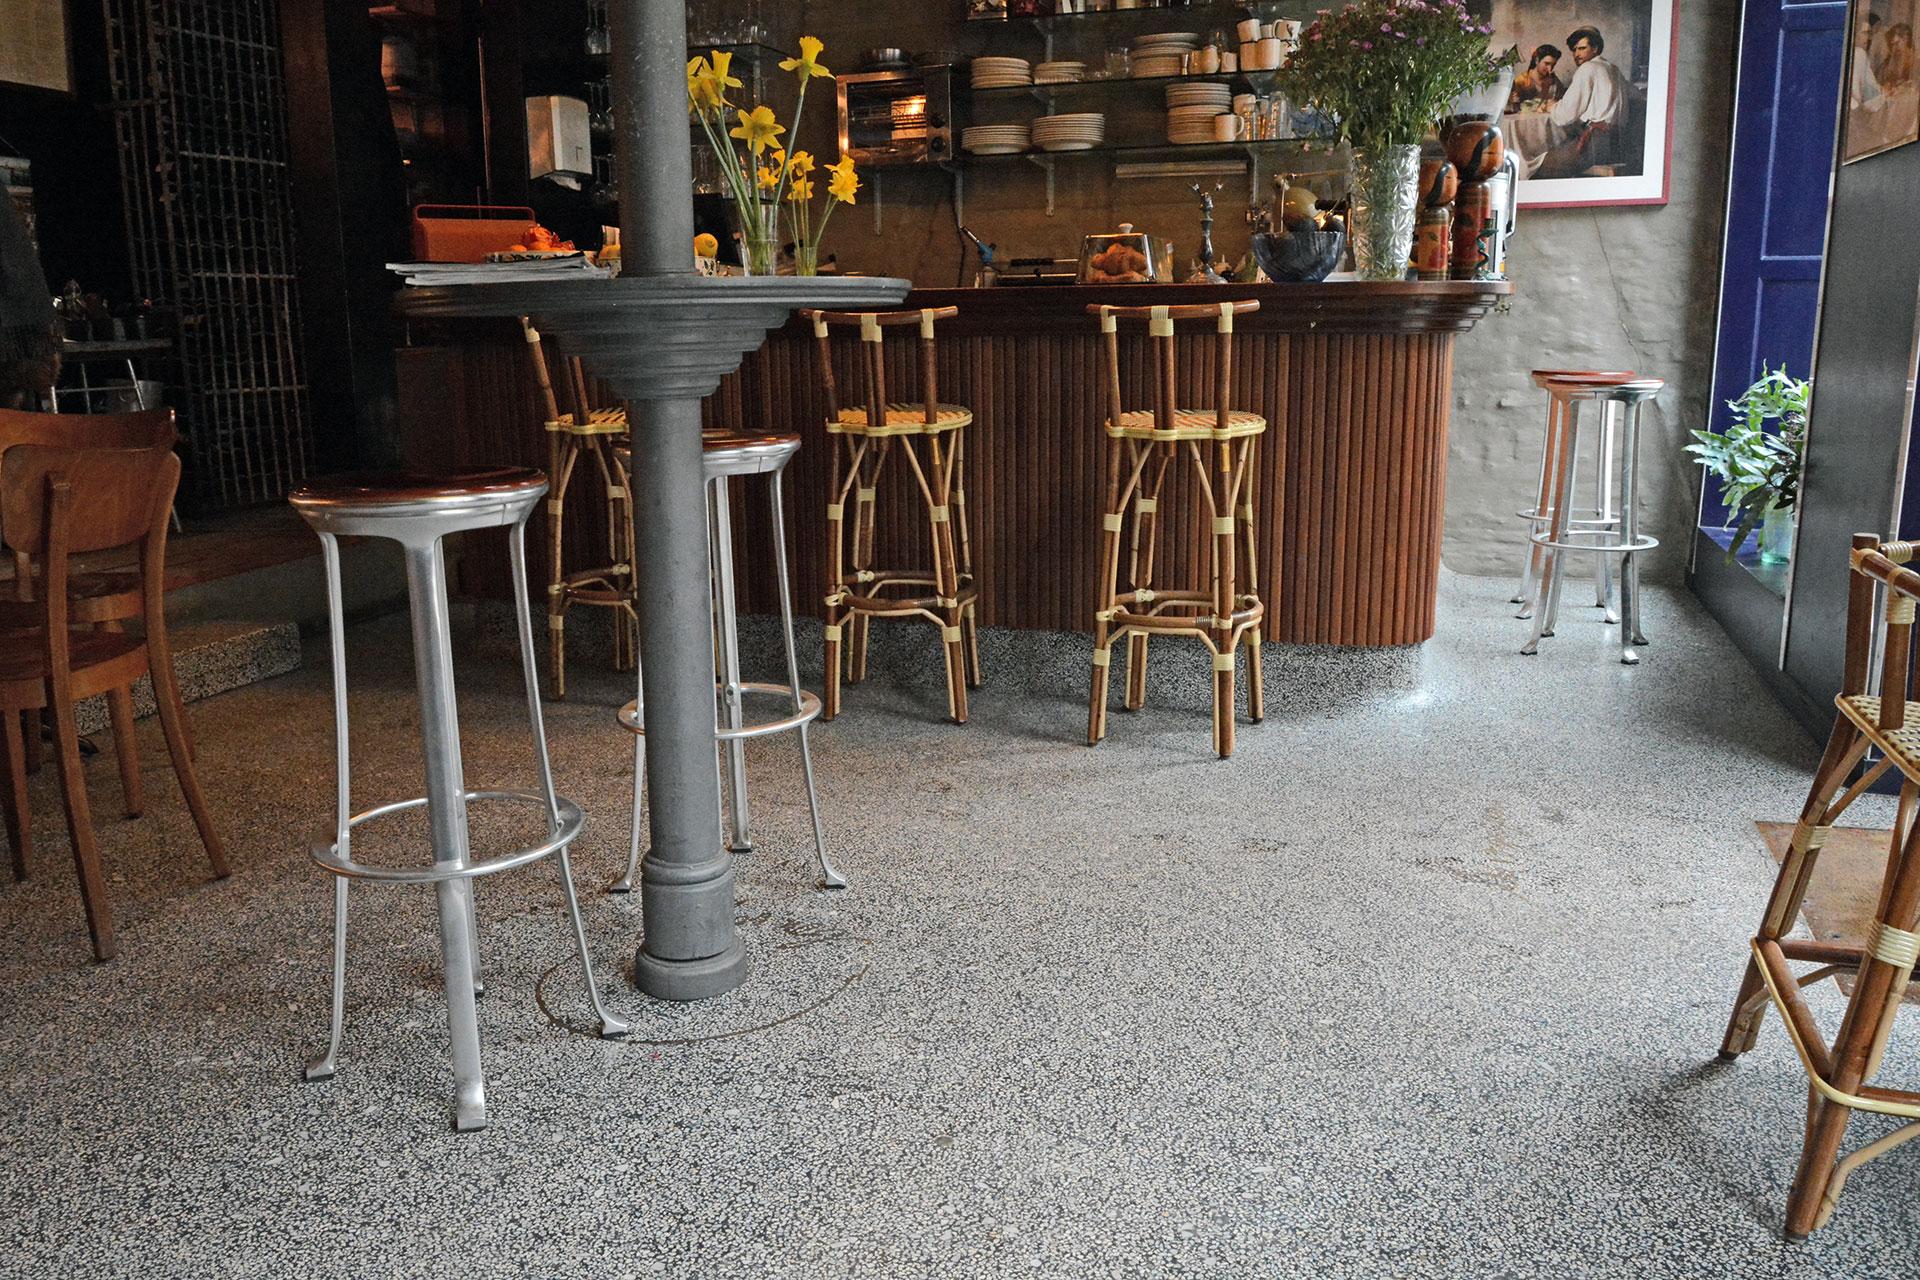 Terrazzogulv i Café - Udført i samarbejde med Lotus Concrete